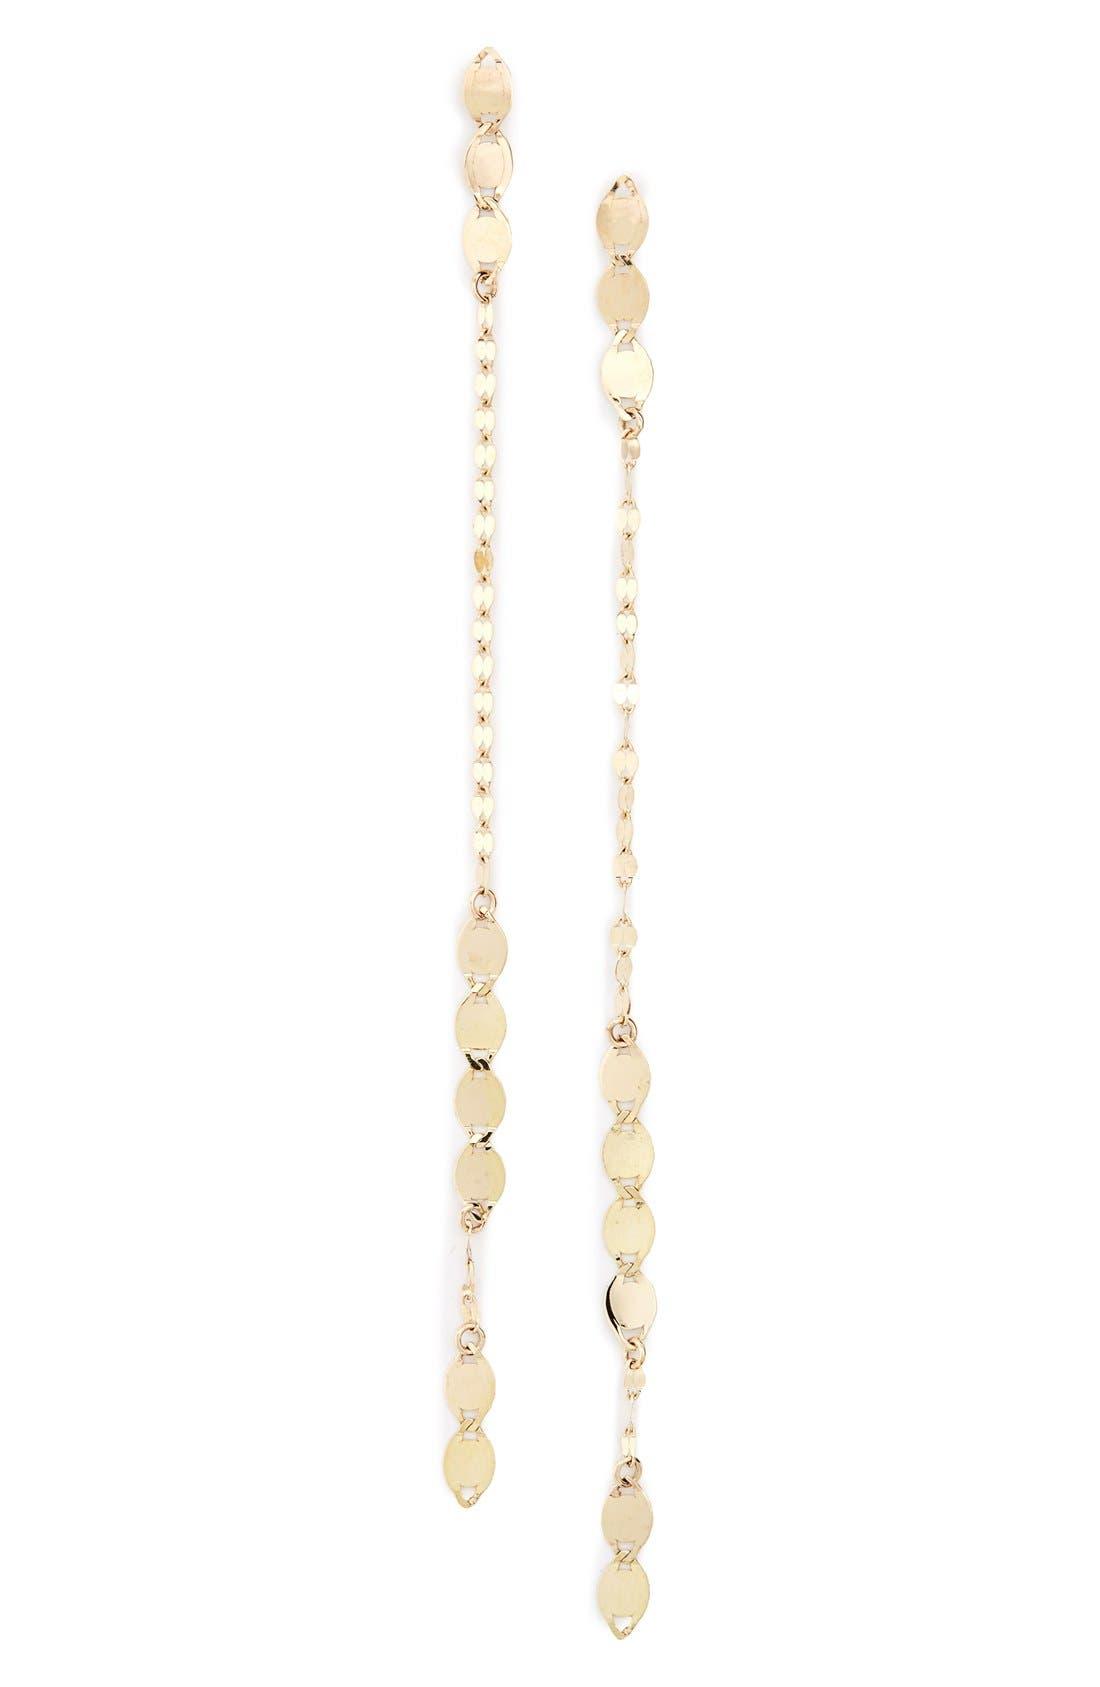 Linear Drop Earrings,                             Main thumbnail 1, color,                             Yellow Gold